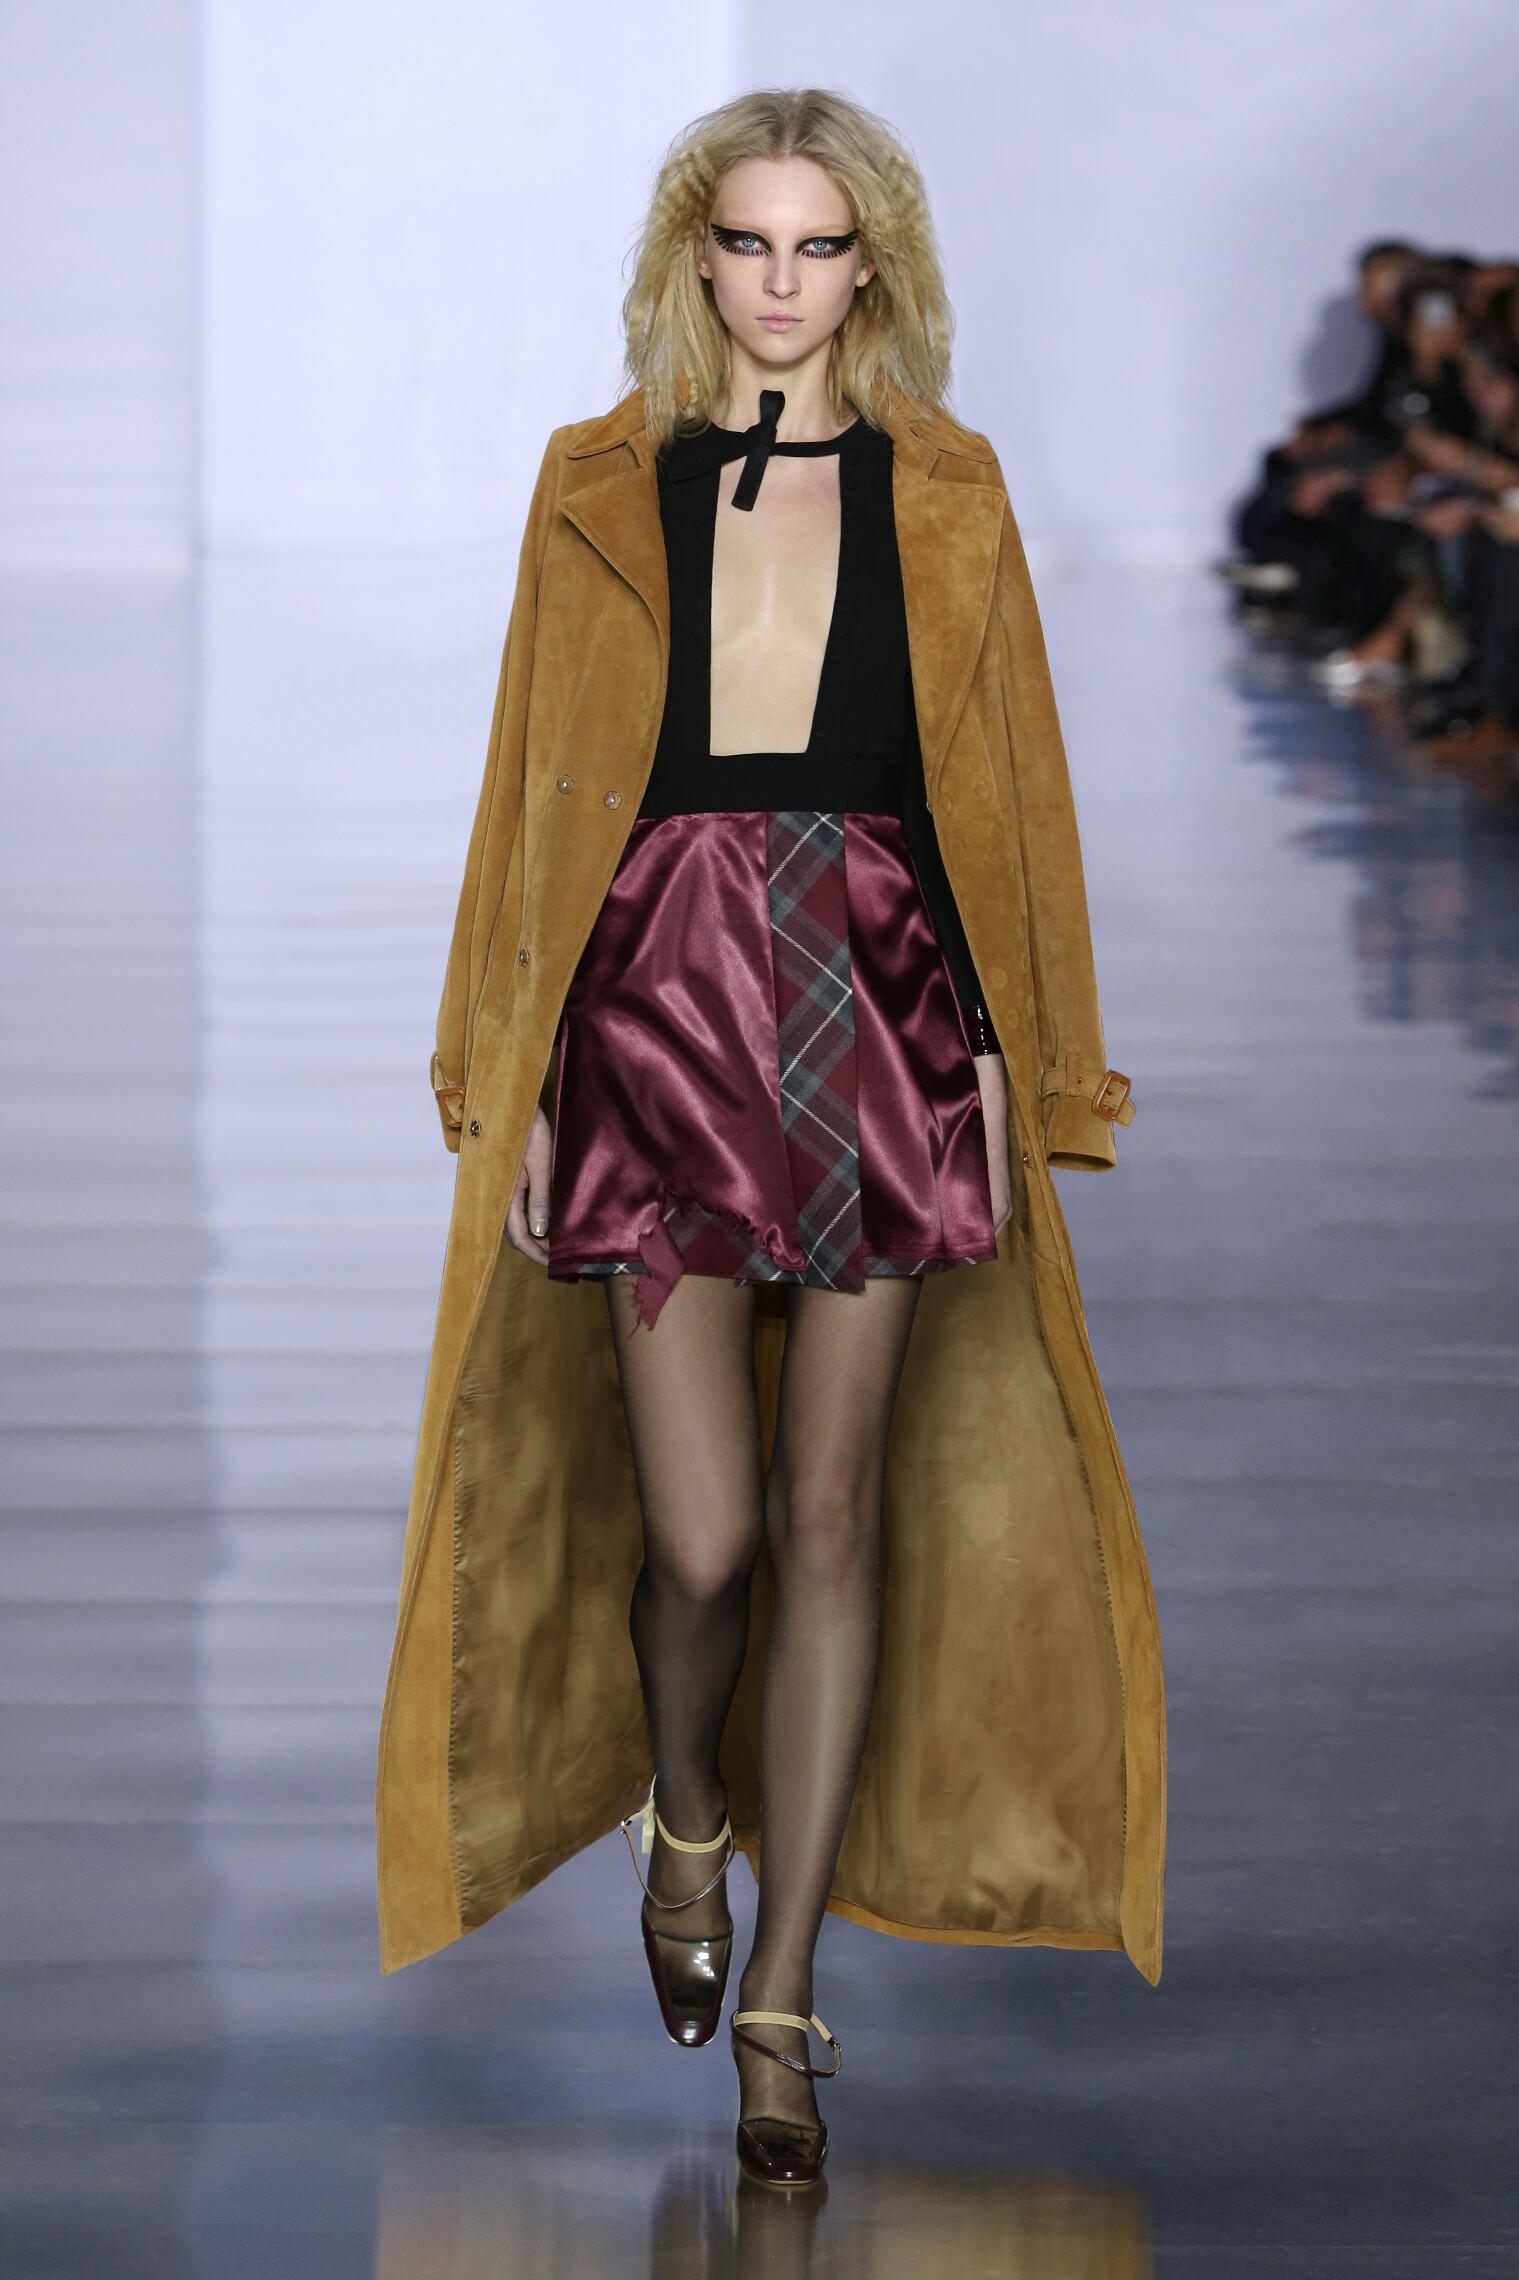 2016 Fall Fashion Woman Maison Margiela Collection